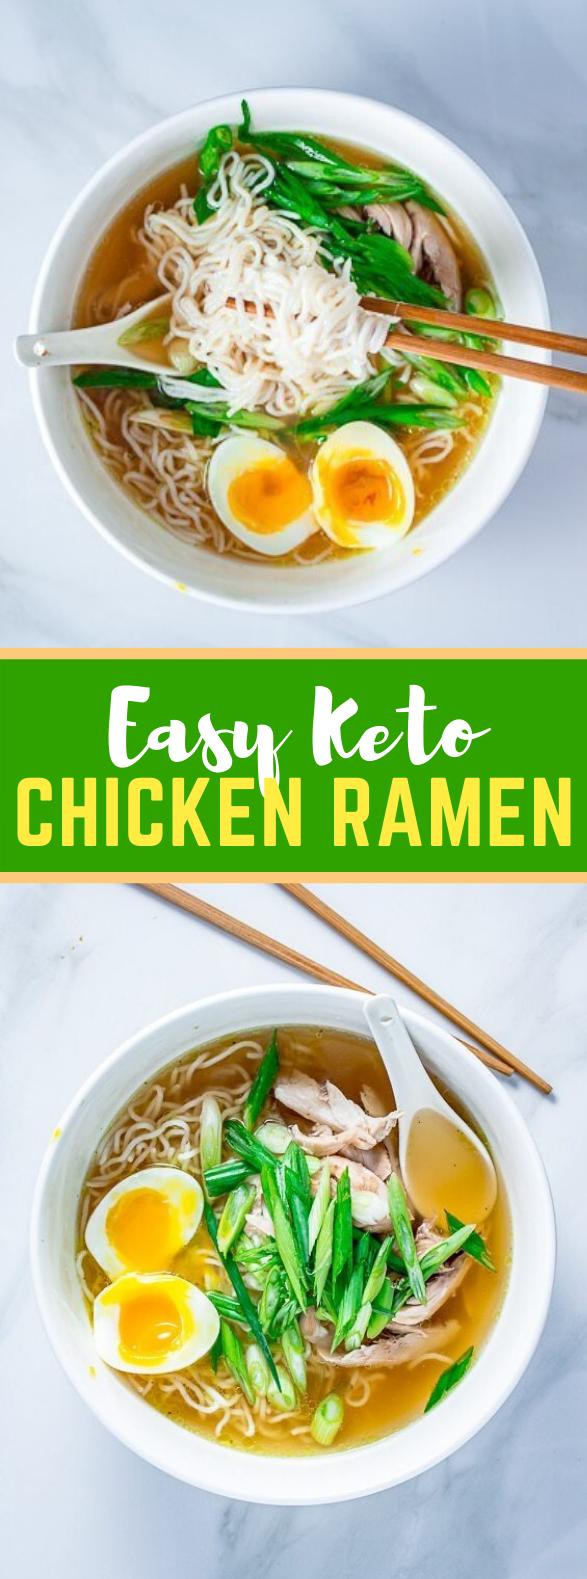 EASY KETO CHICKEN RAMEN #japanesefood #healthy